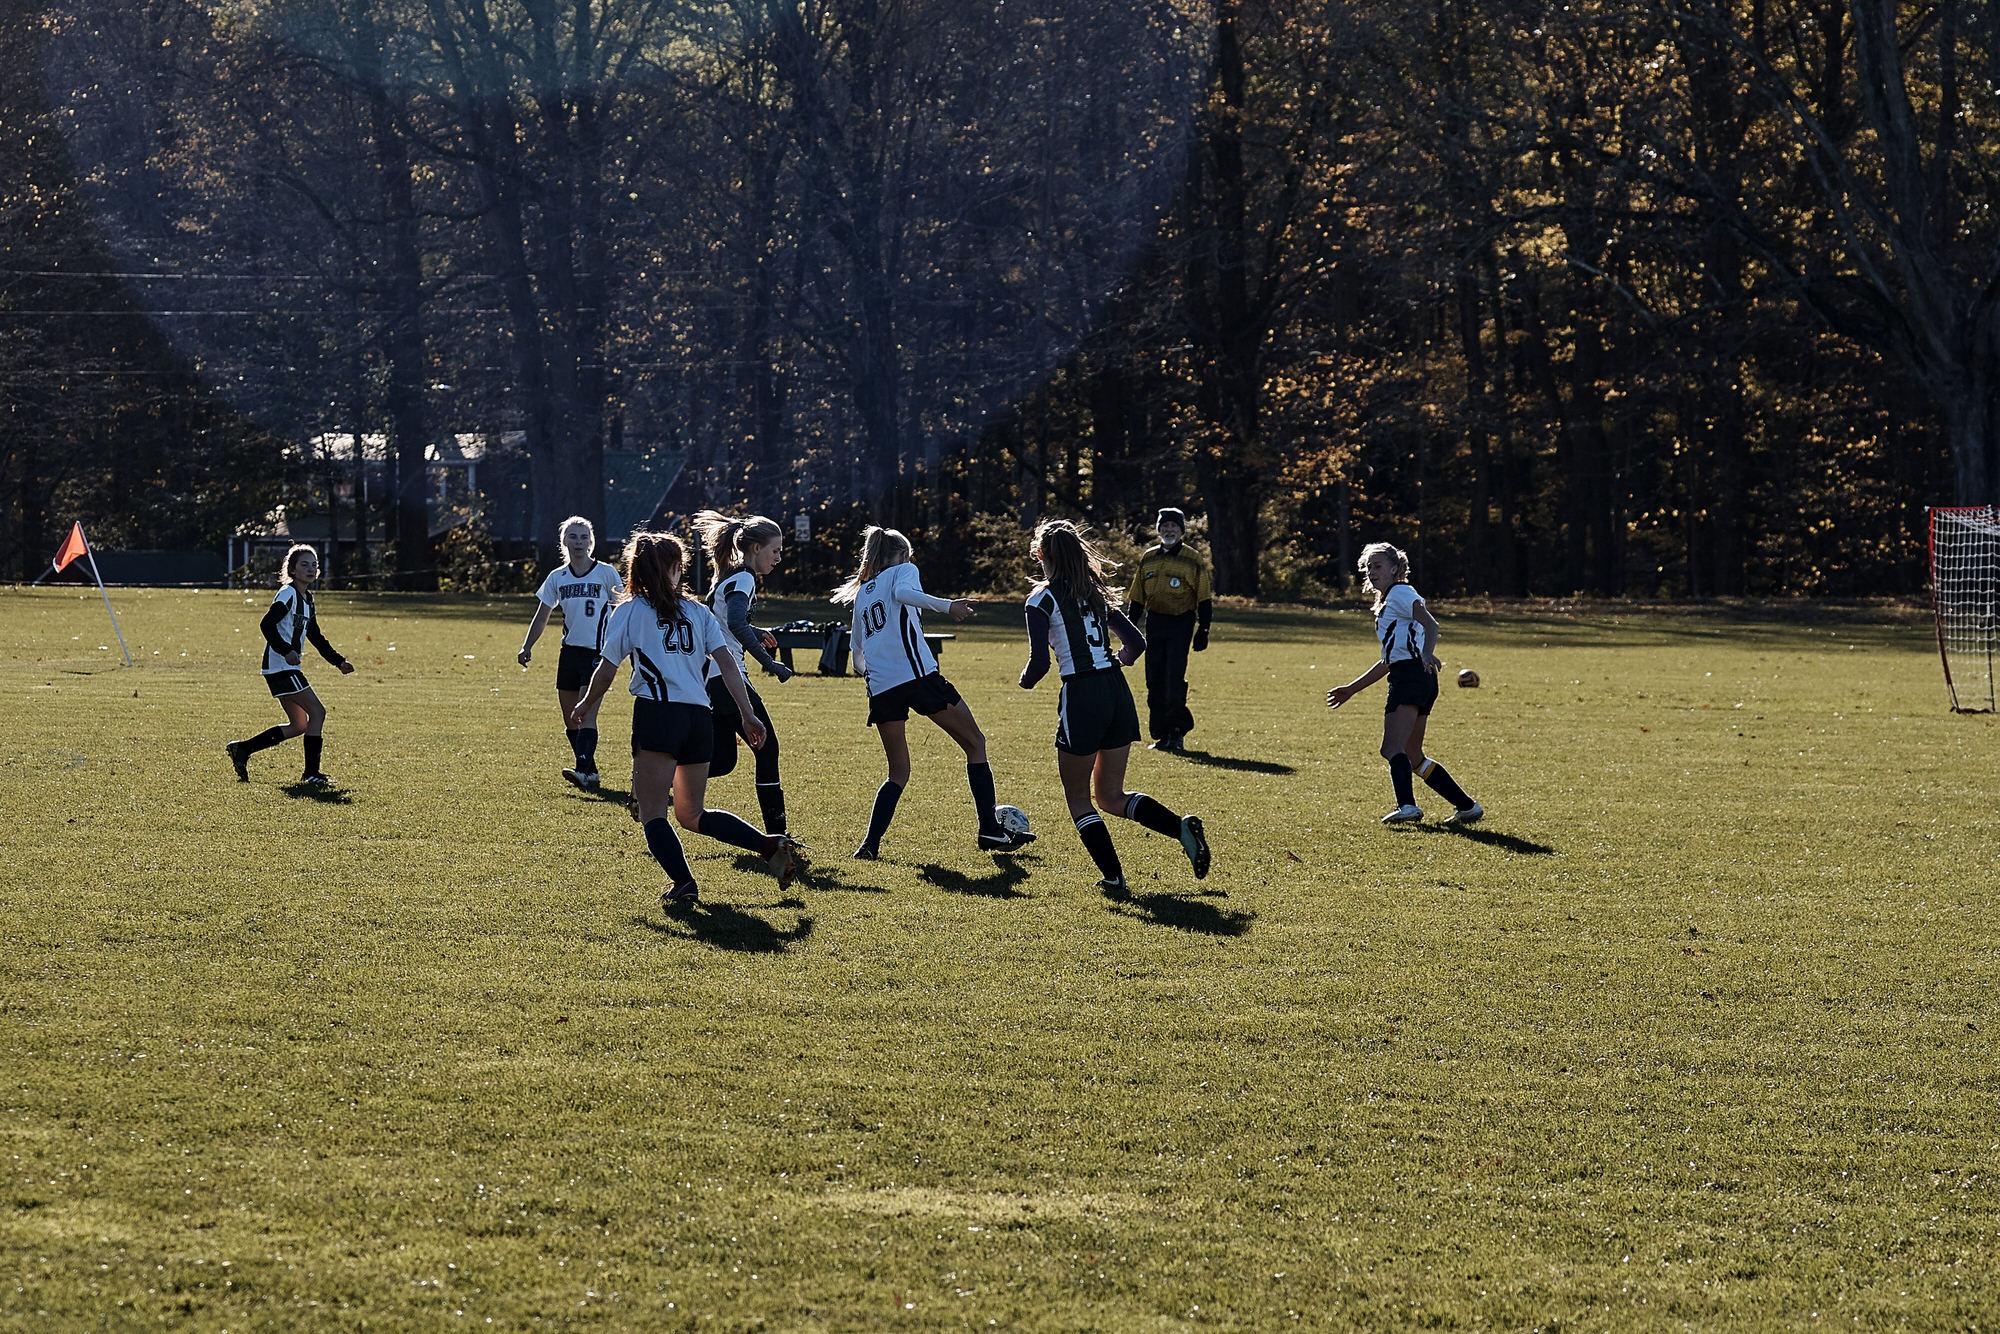 Girls Varsity Soccer vs. Putney School - October 26, 2018 - 025.jpg